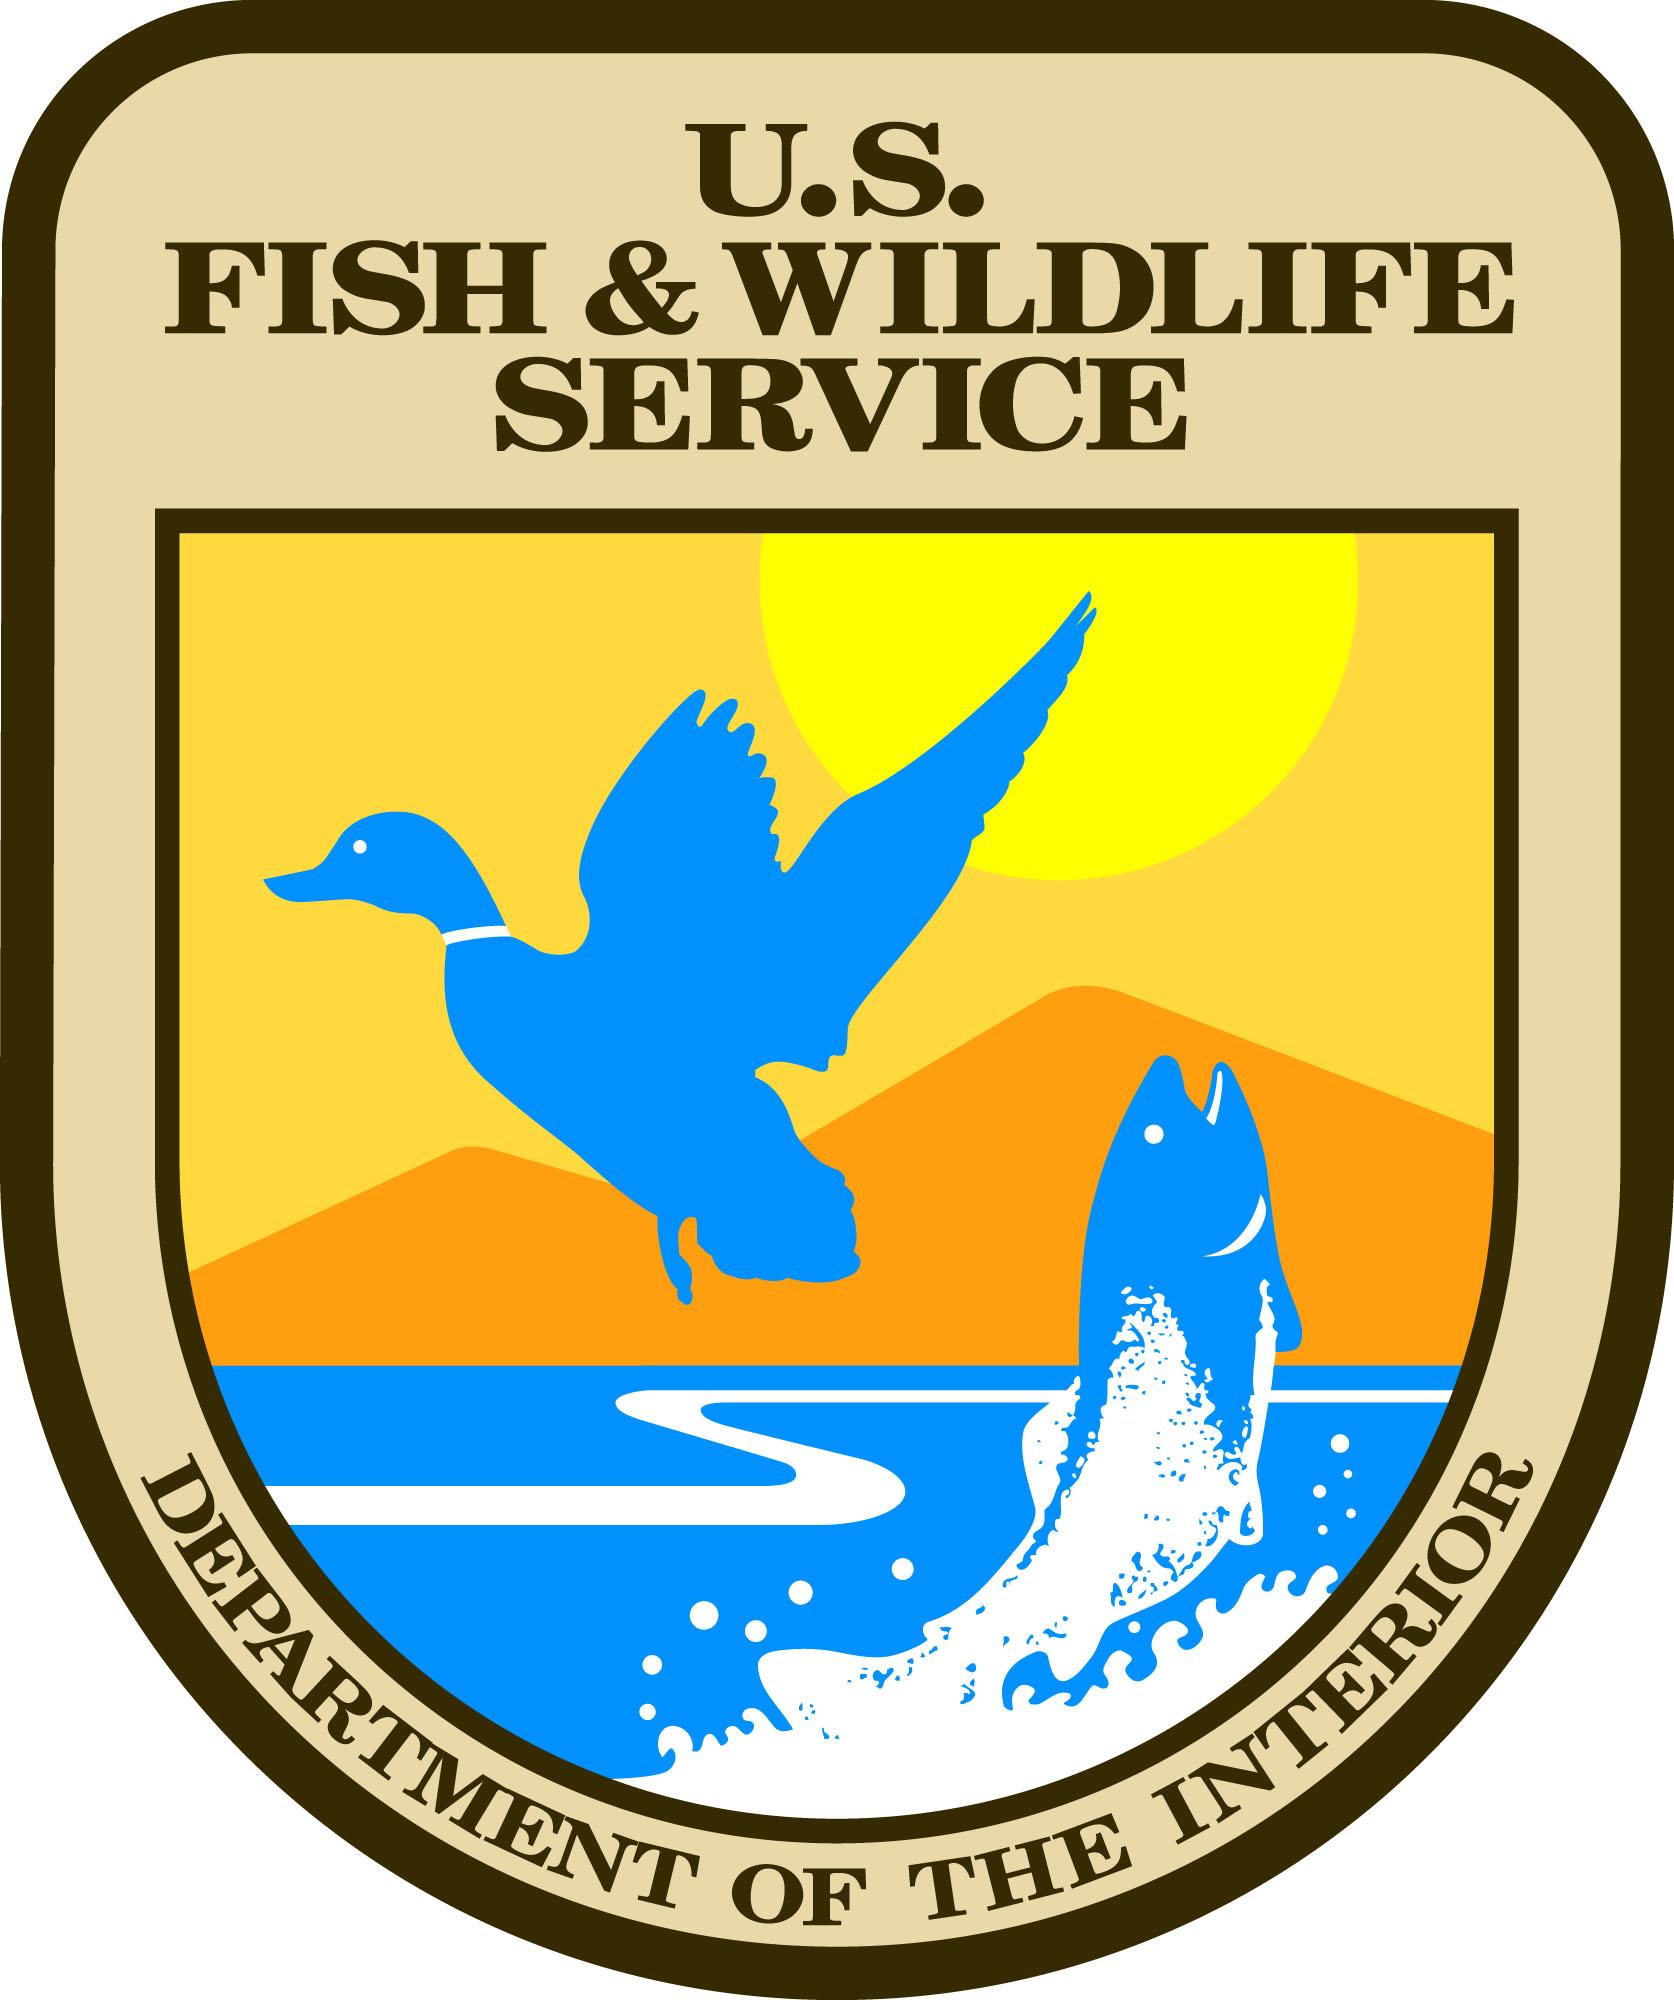 fishandwildlife